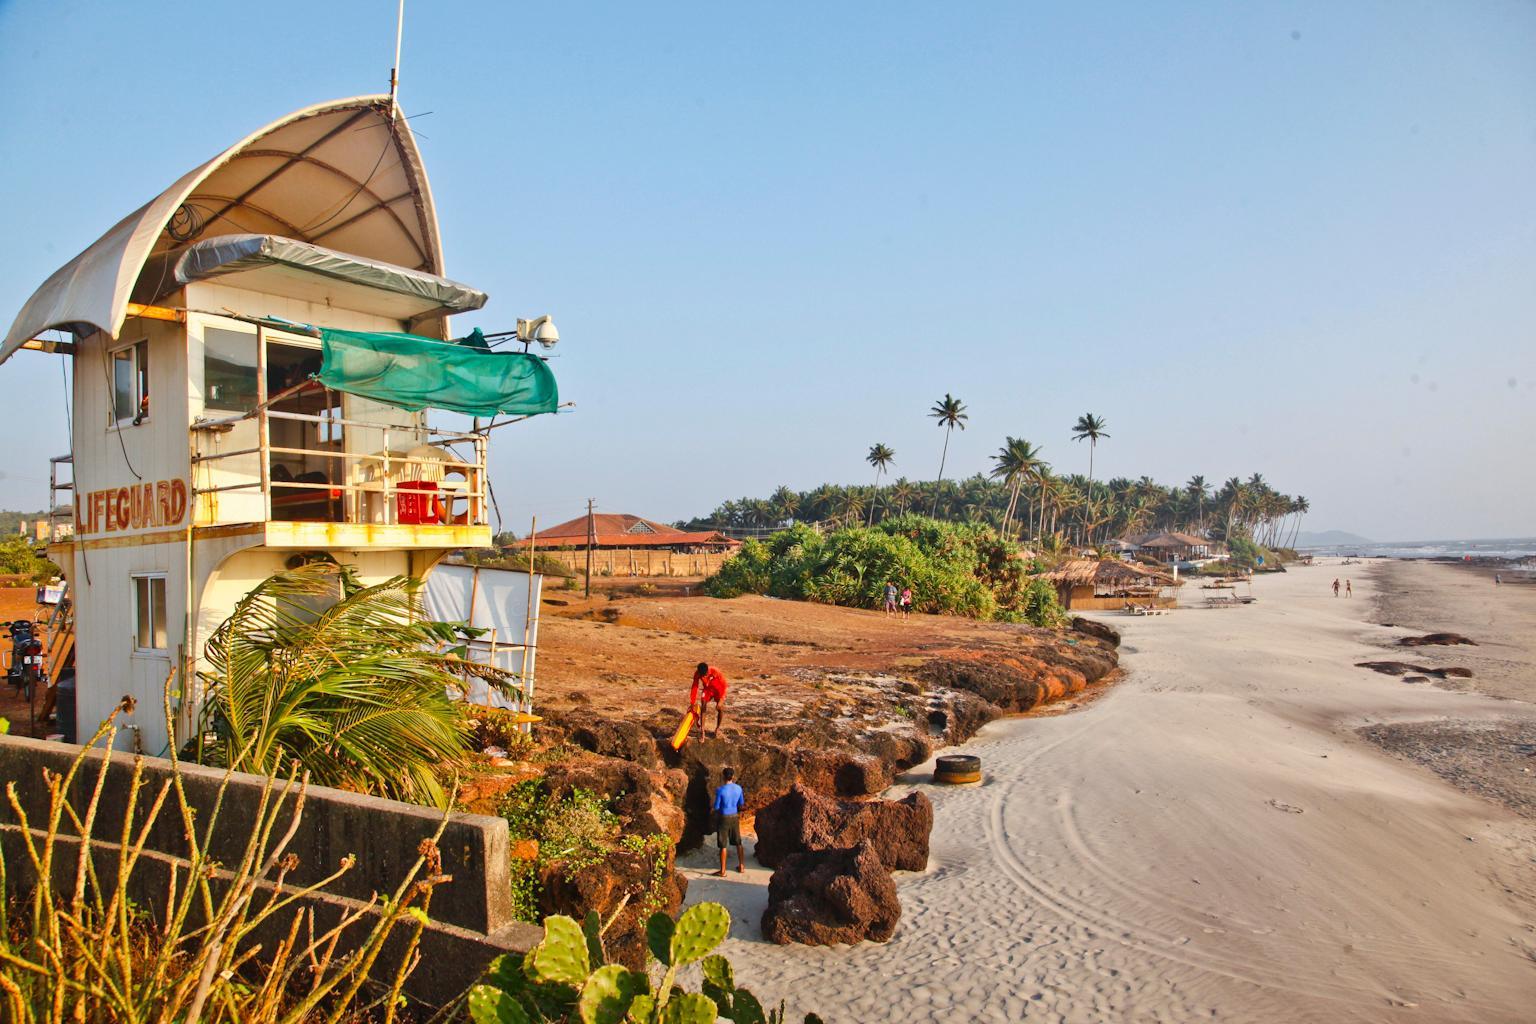 Aswem Beach